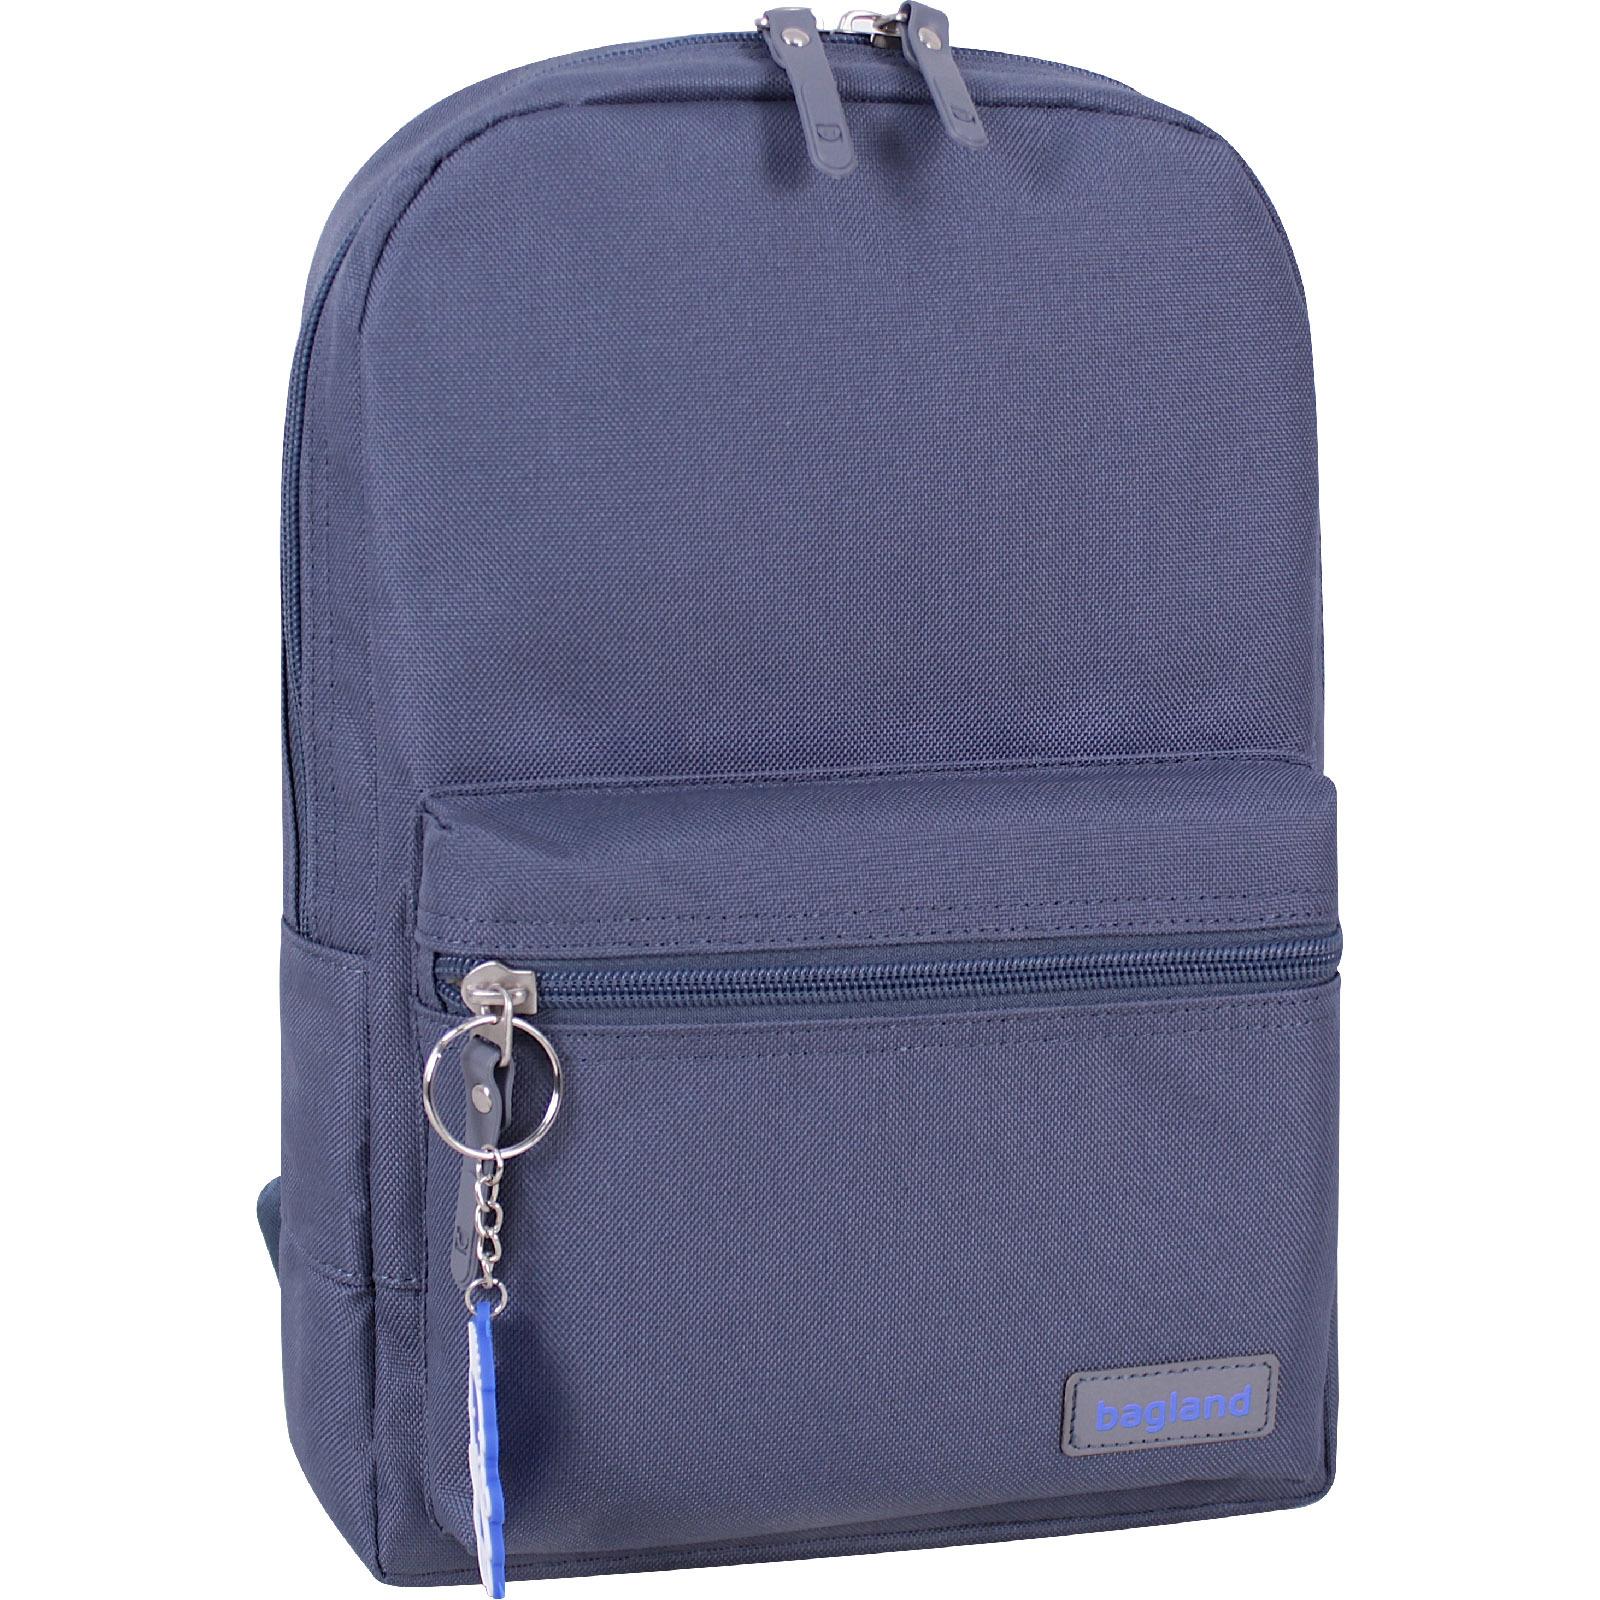 Детские рюкзаки Рюкзак Bagland Молодежный mini 8 л. серый (0050866) IMG_0111.jpg